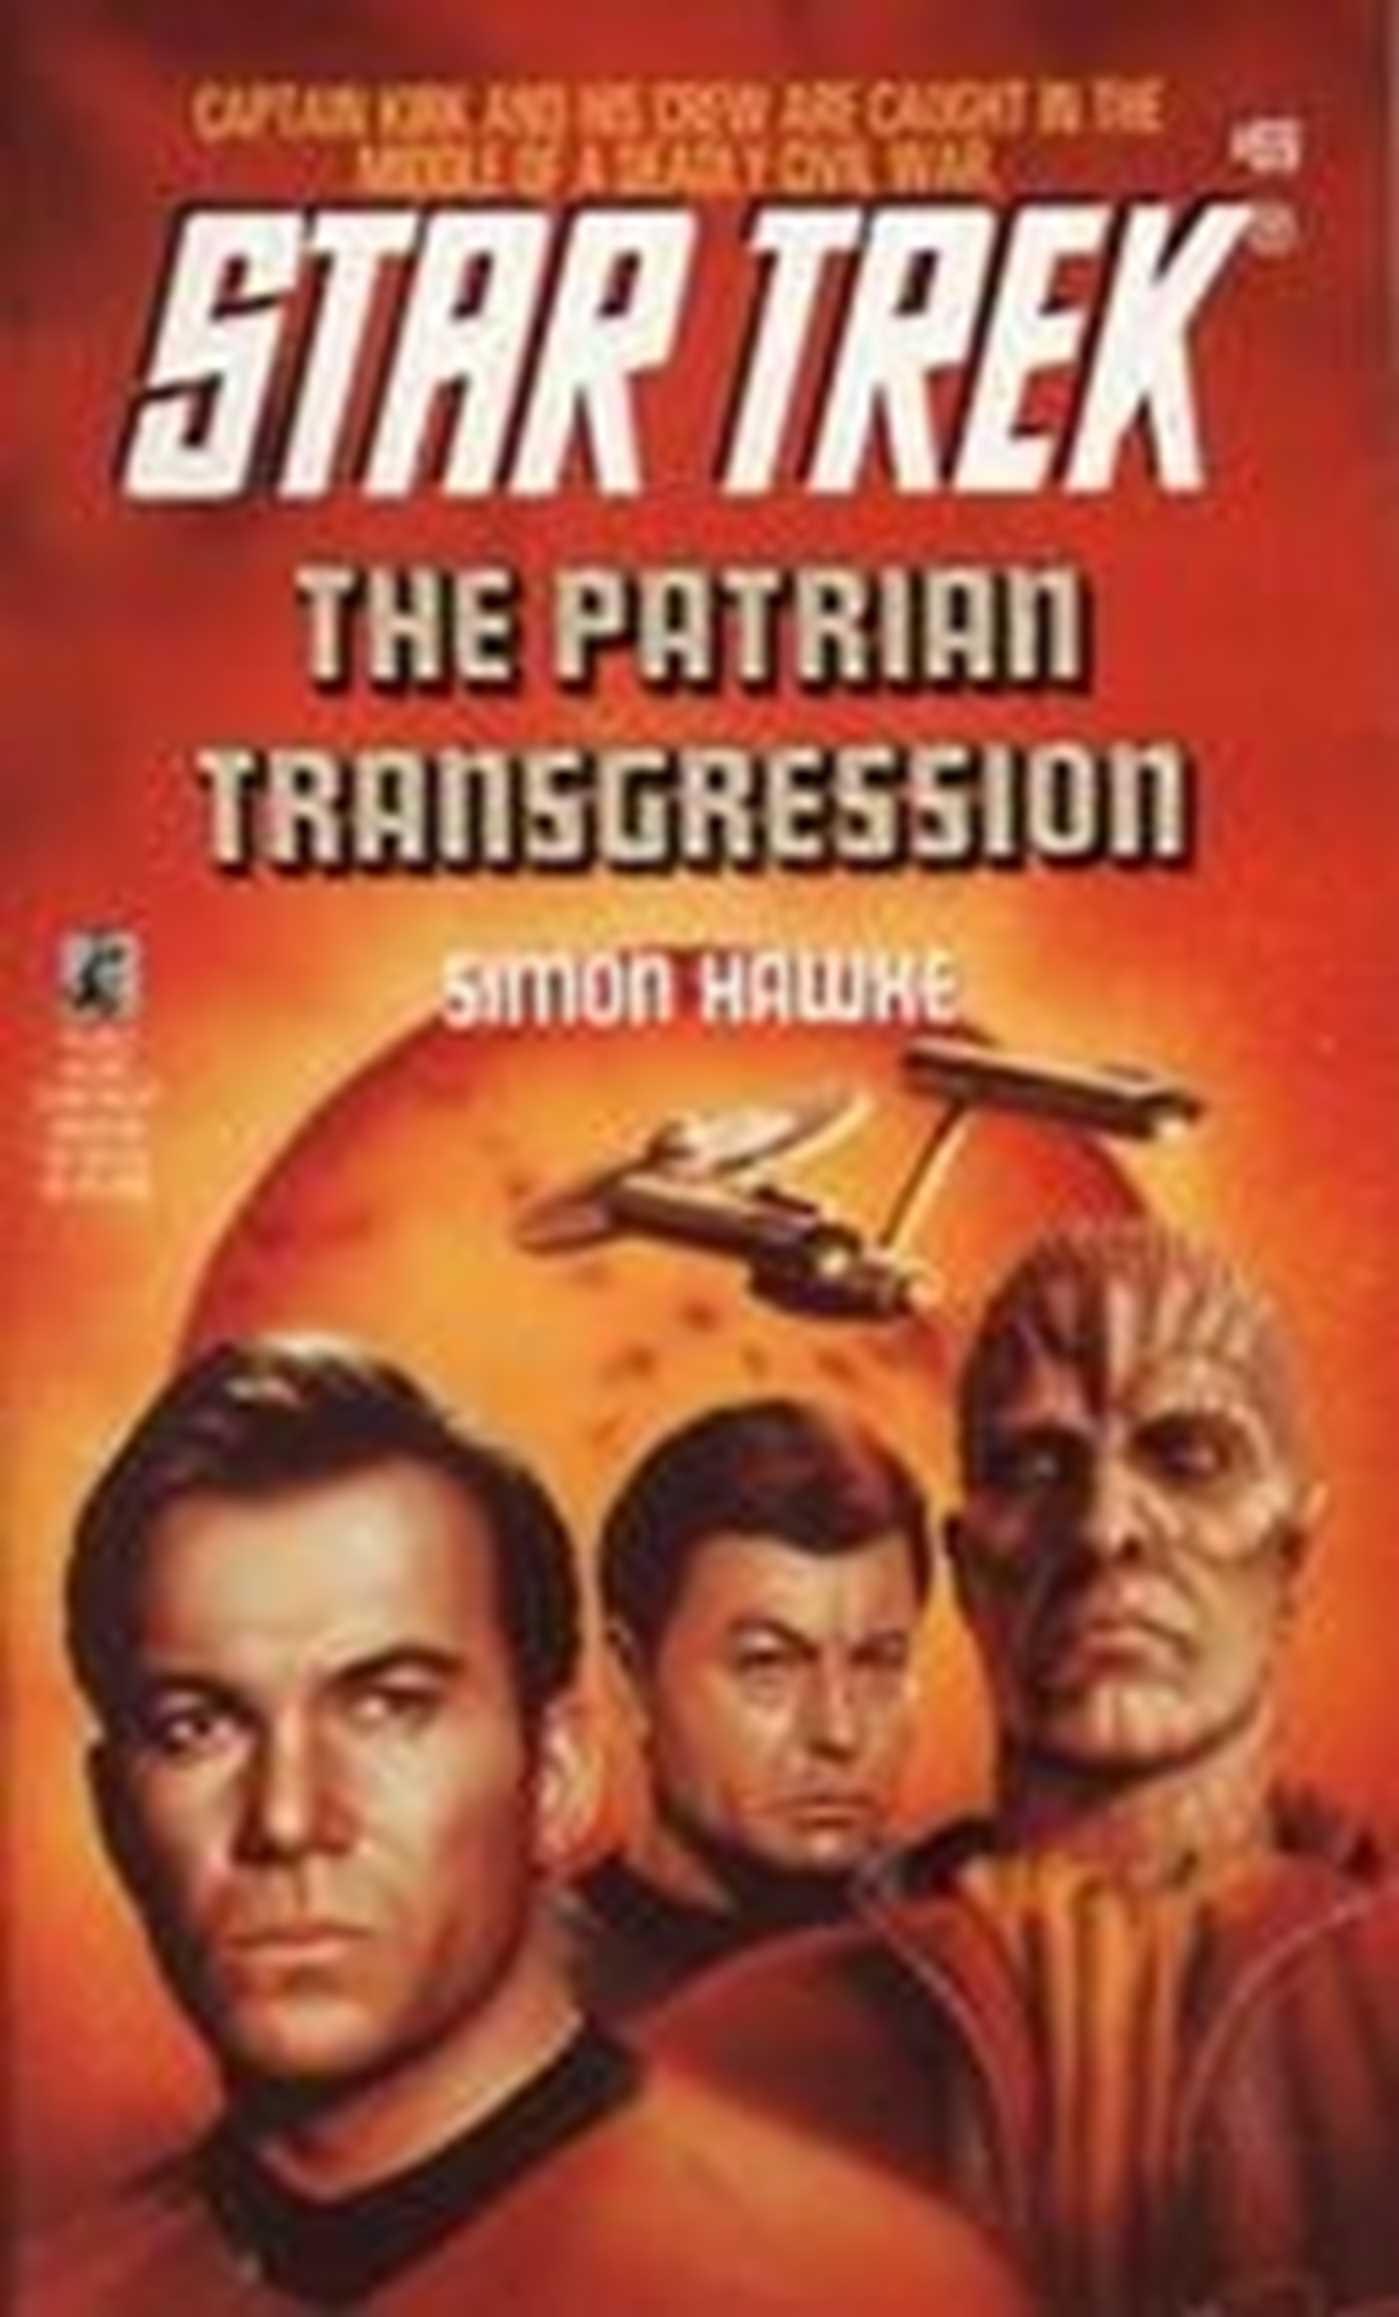 The patrian transgression 9780743420204 hr